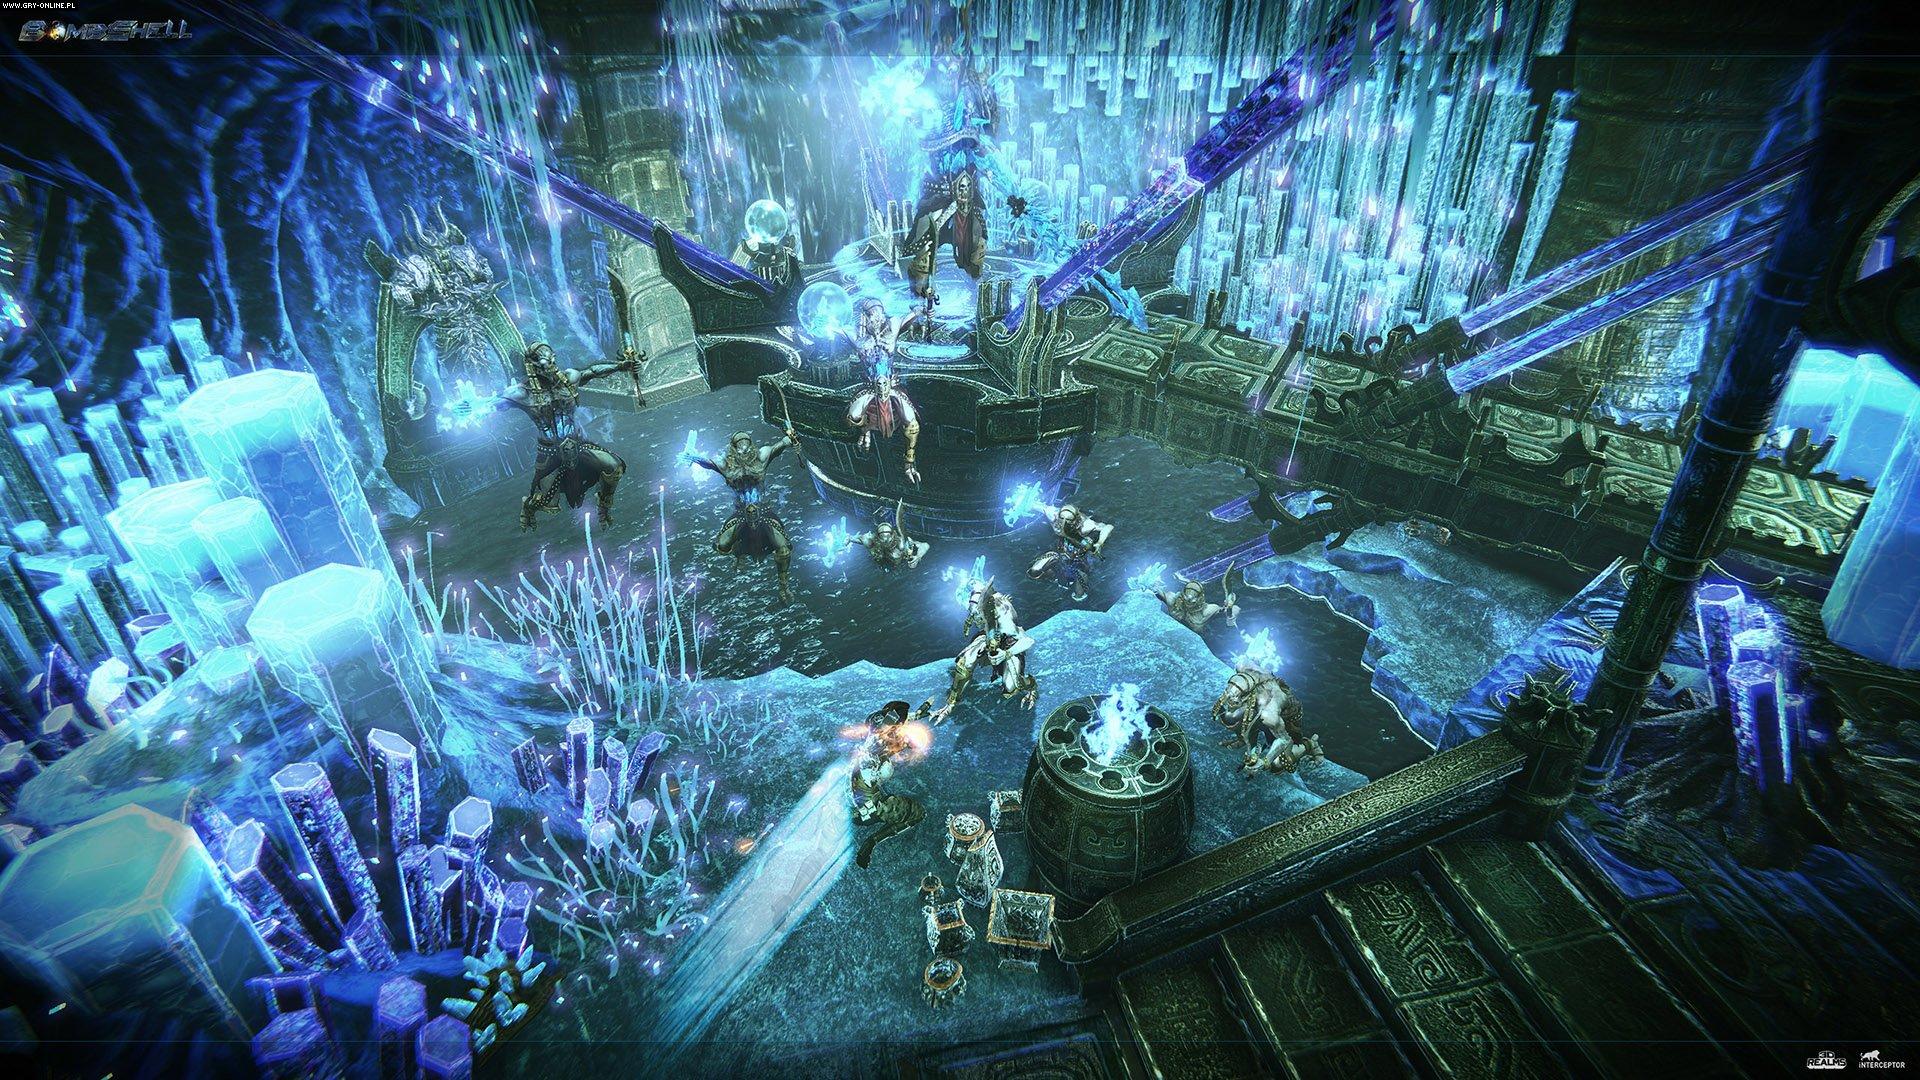 Ps4 Games Science Fiction : Bombshell screenshots gallery screenshot